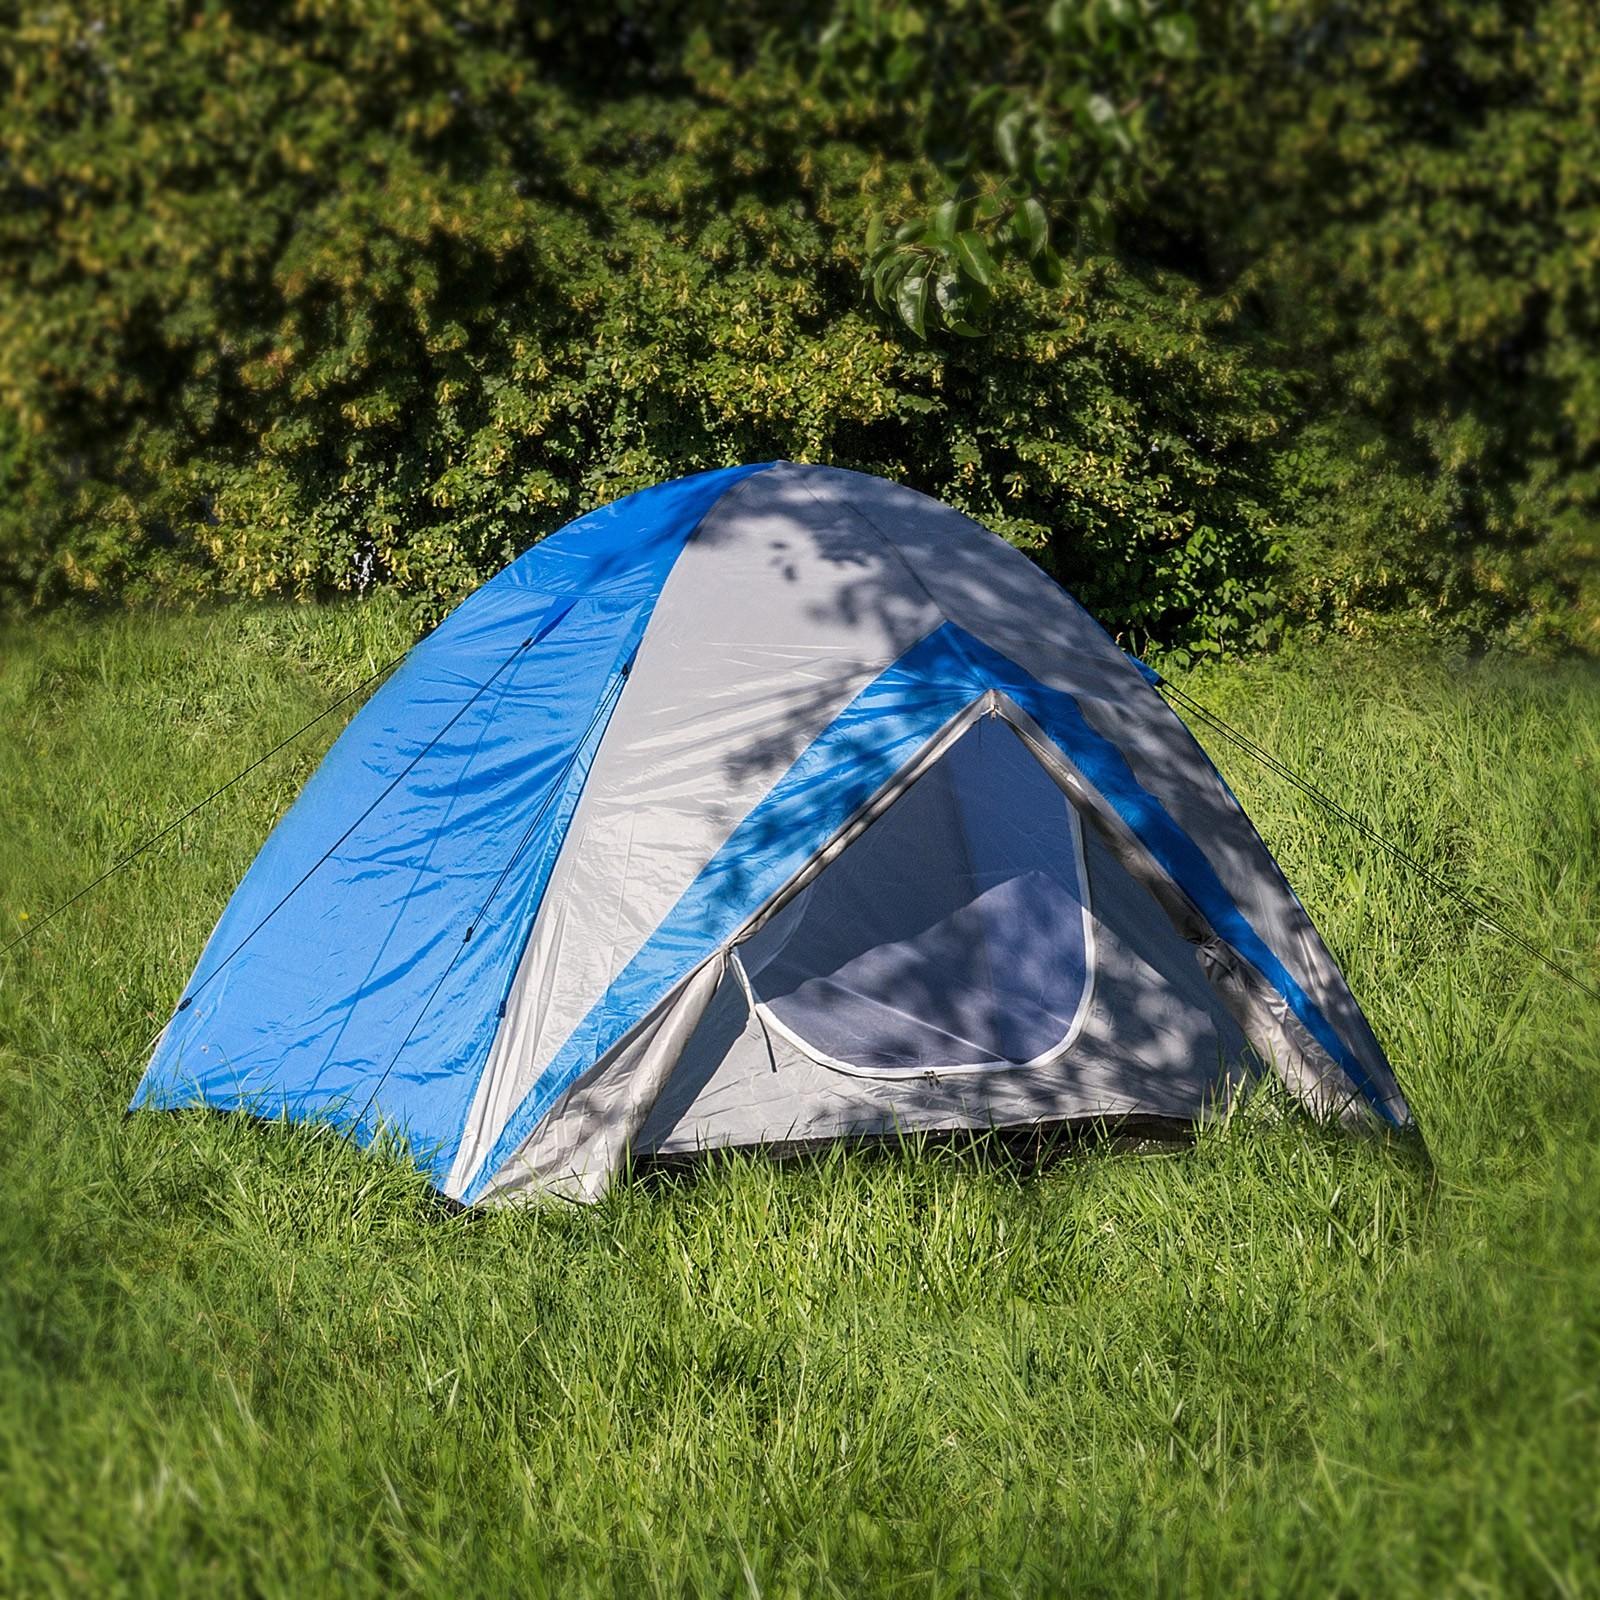 Dema Campingzelt / Zelt For-Four für 4 Personen 410x240x165 cm 43231